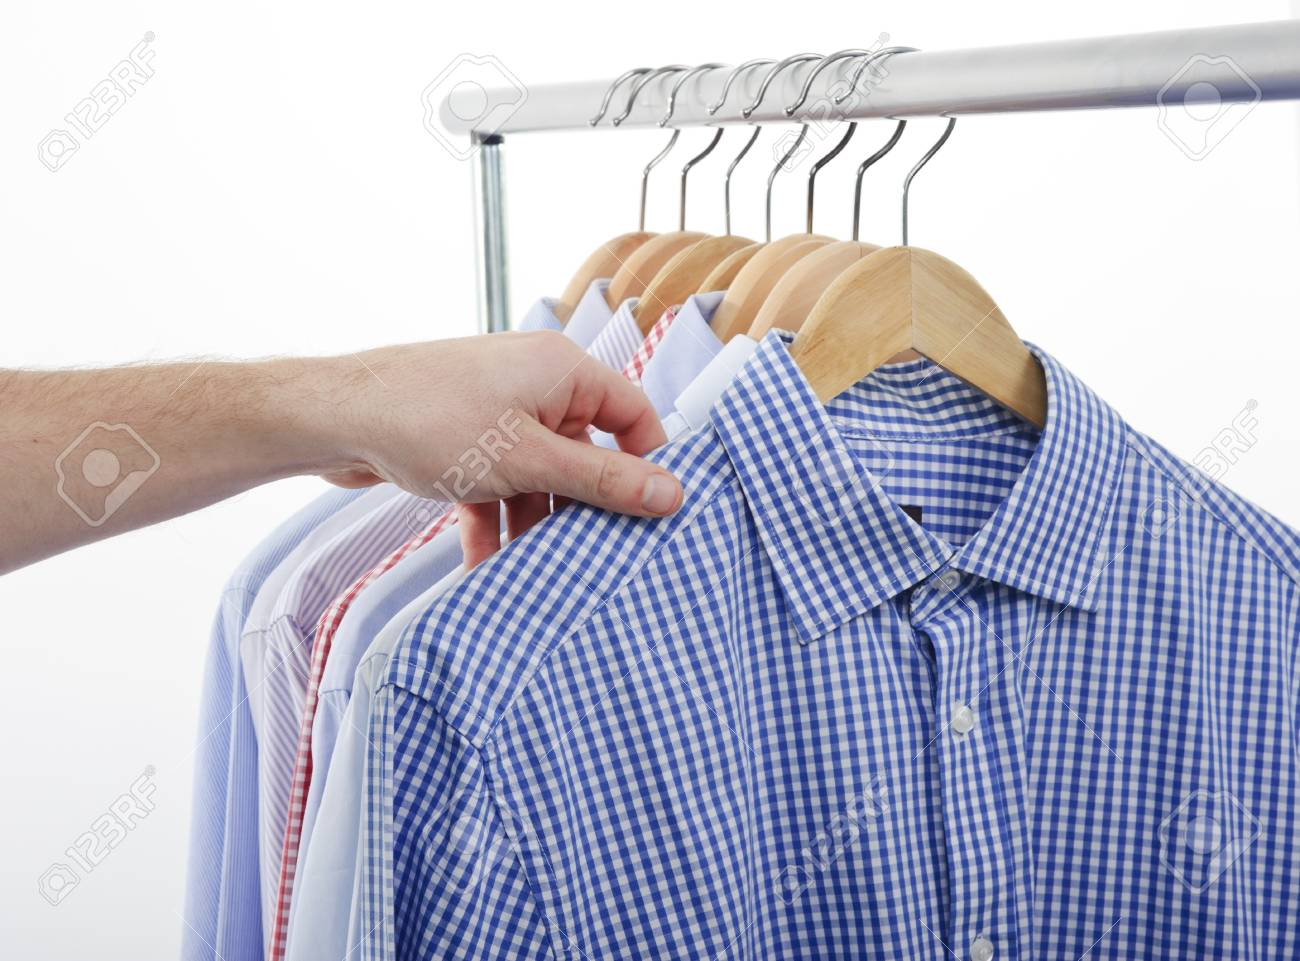 man choosing and taking his shirt Stock Photo - 11406001